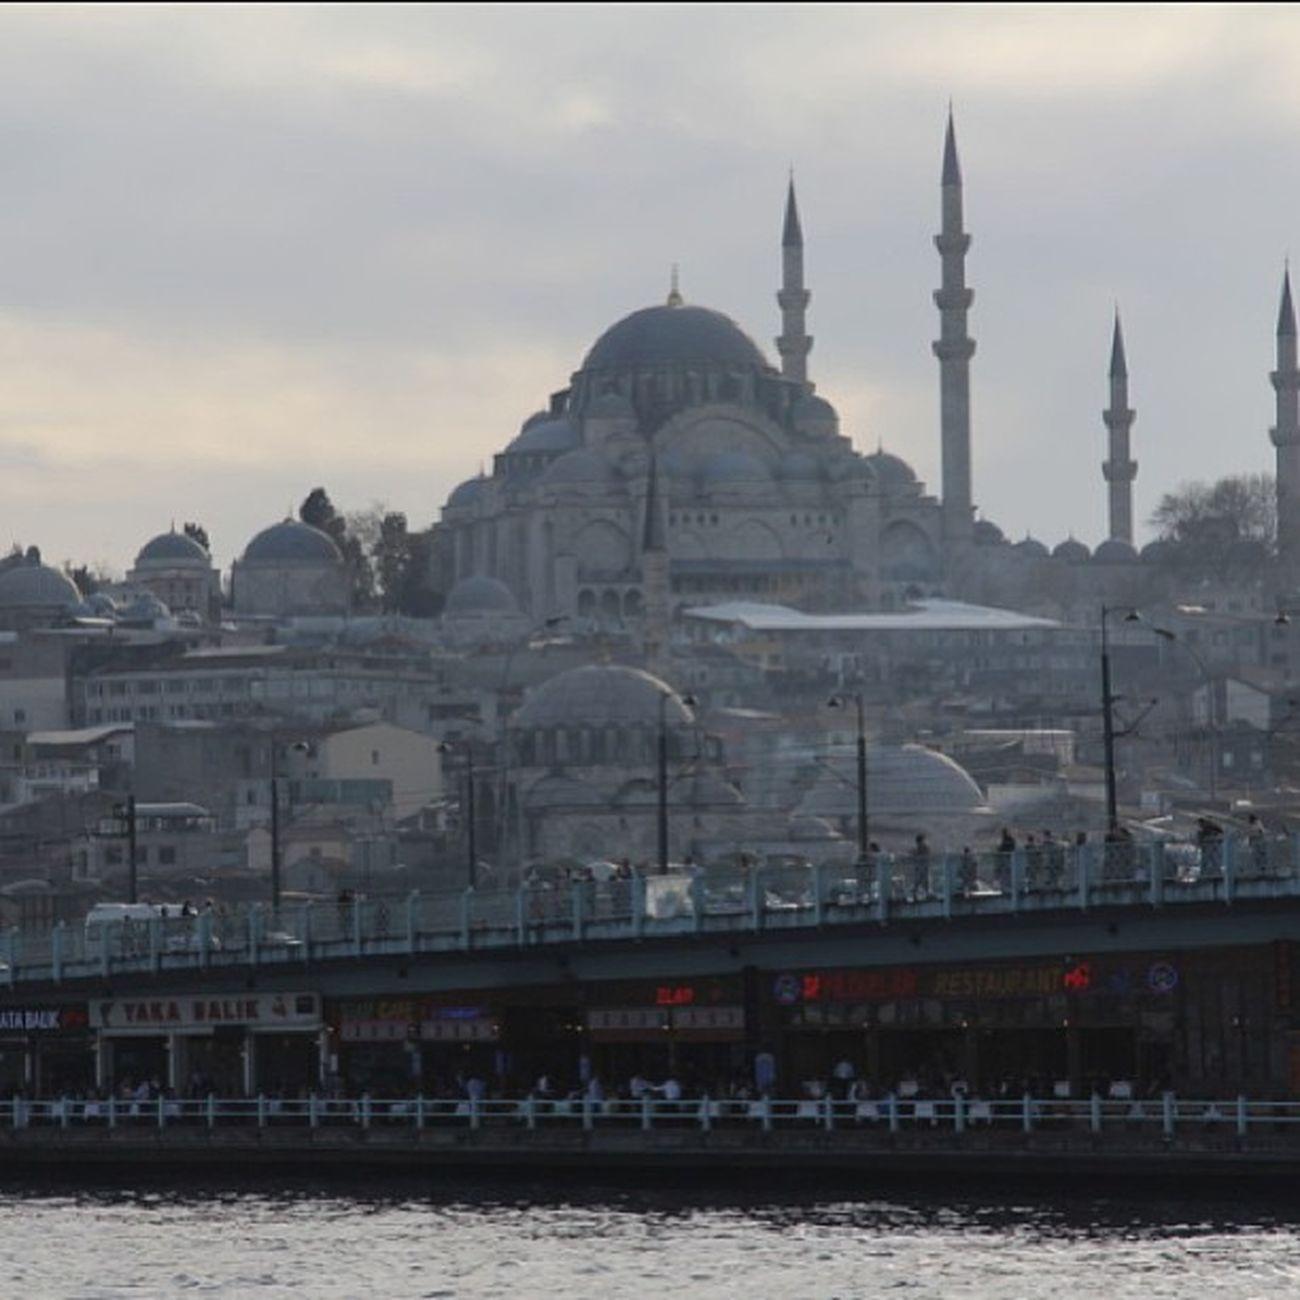 Istanbul City Sehir Citylife manzara nature eminonu galata galatakoprusu kopru bridge suleymaniyecamii suleymaniye cami mosque architech mimari